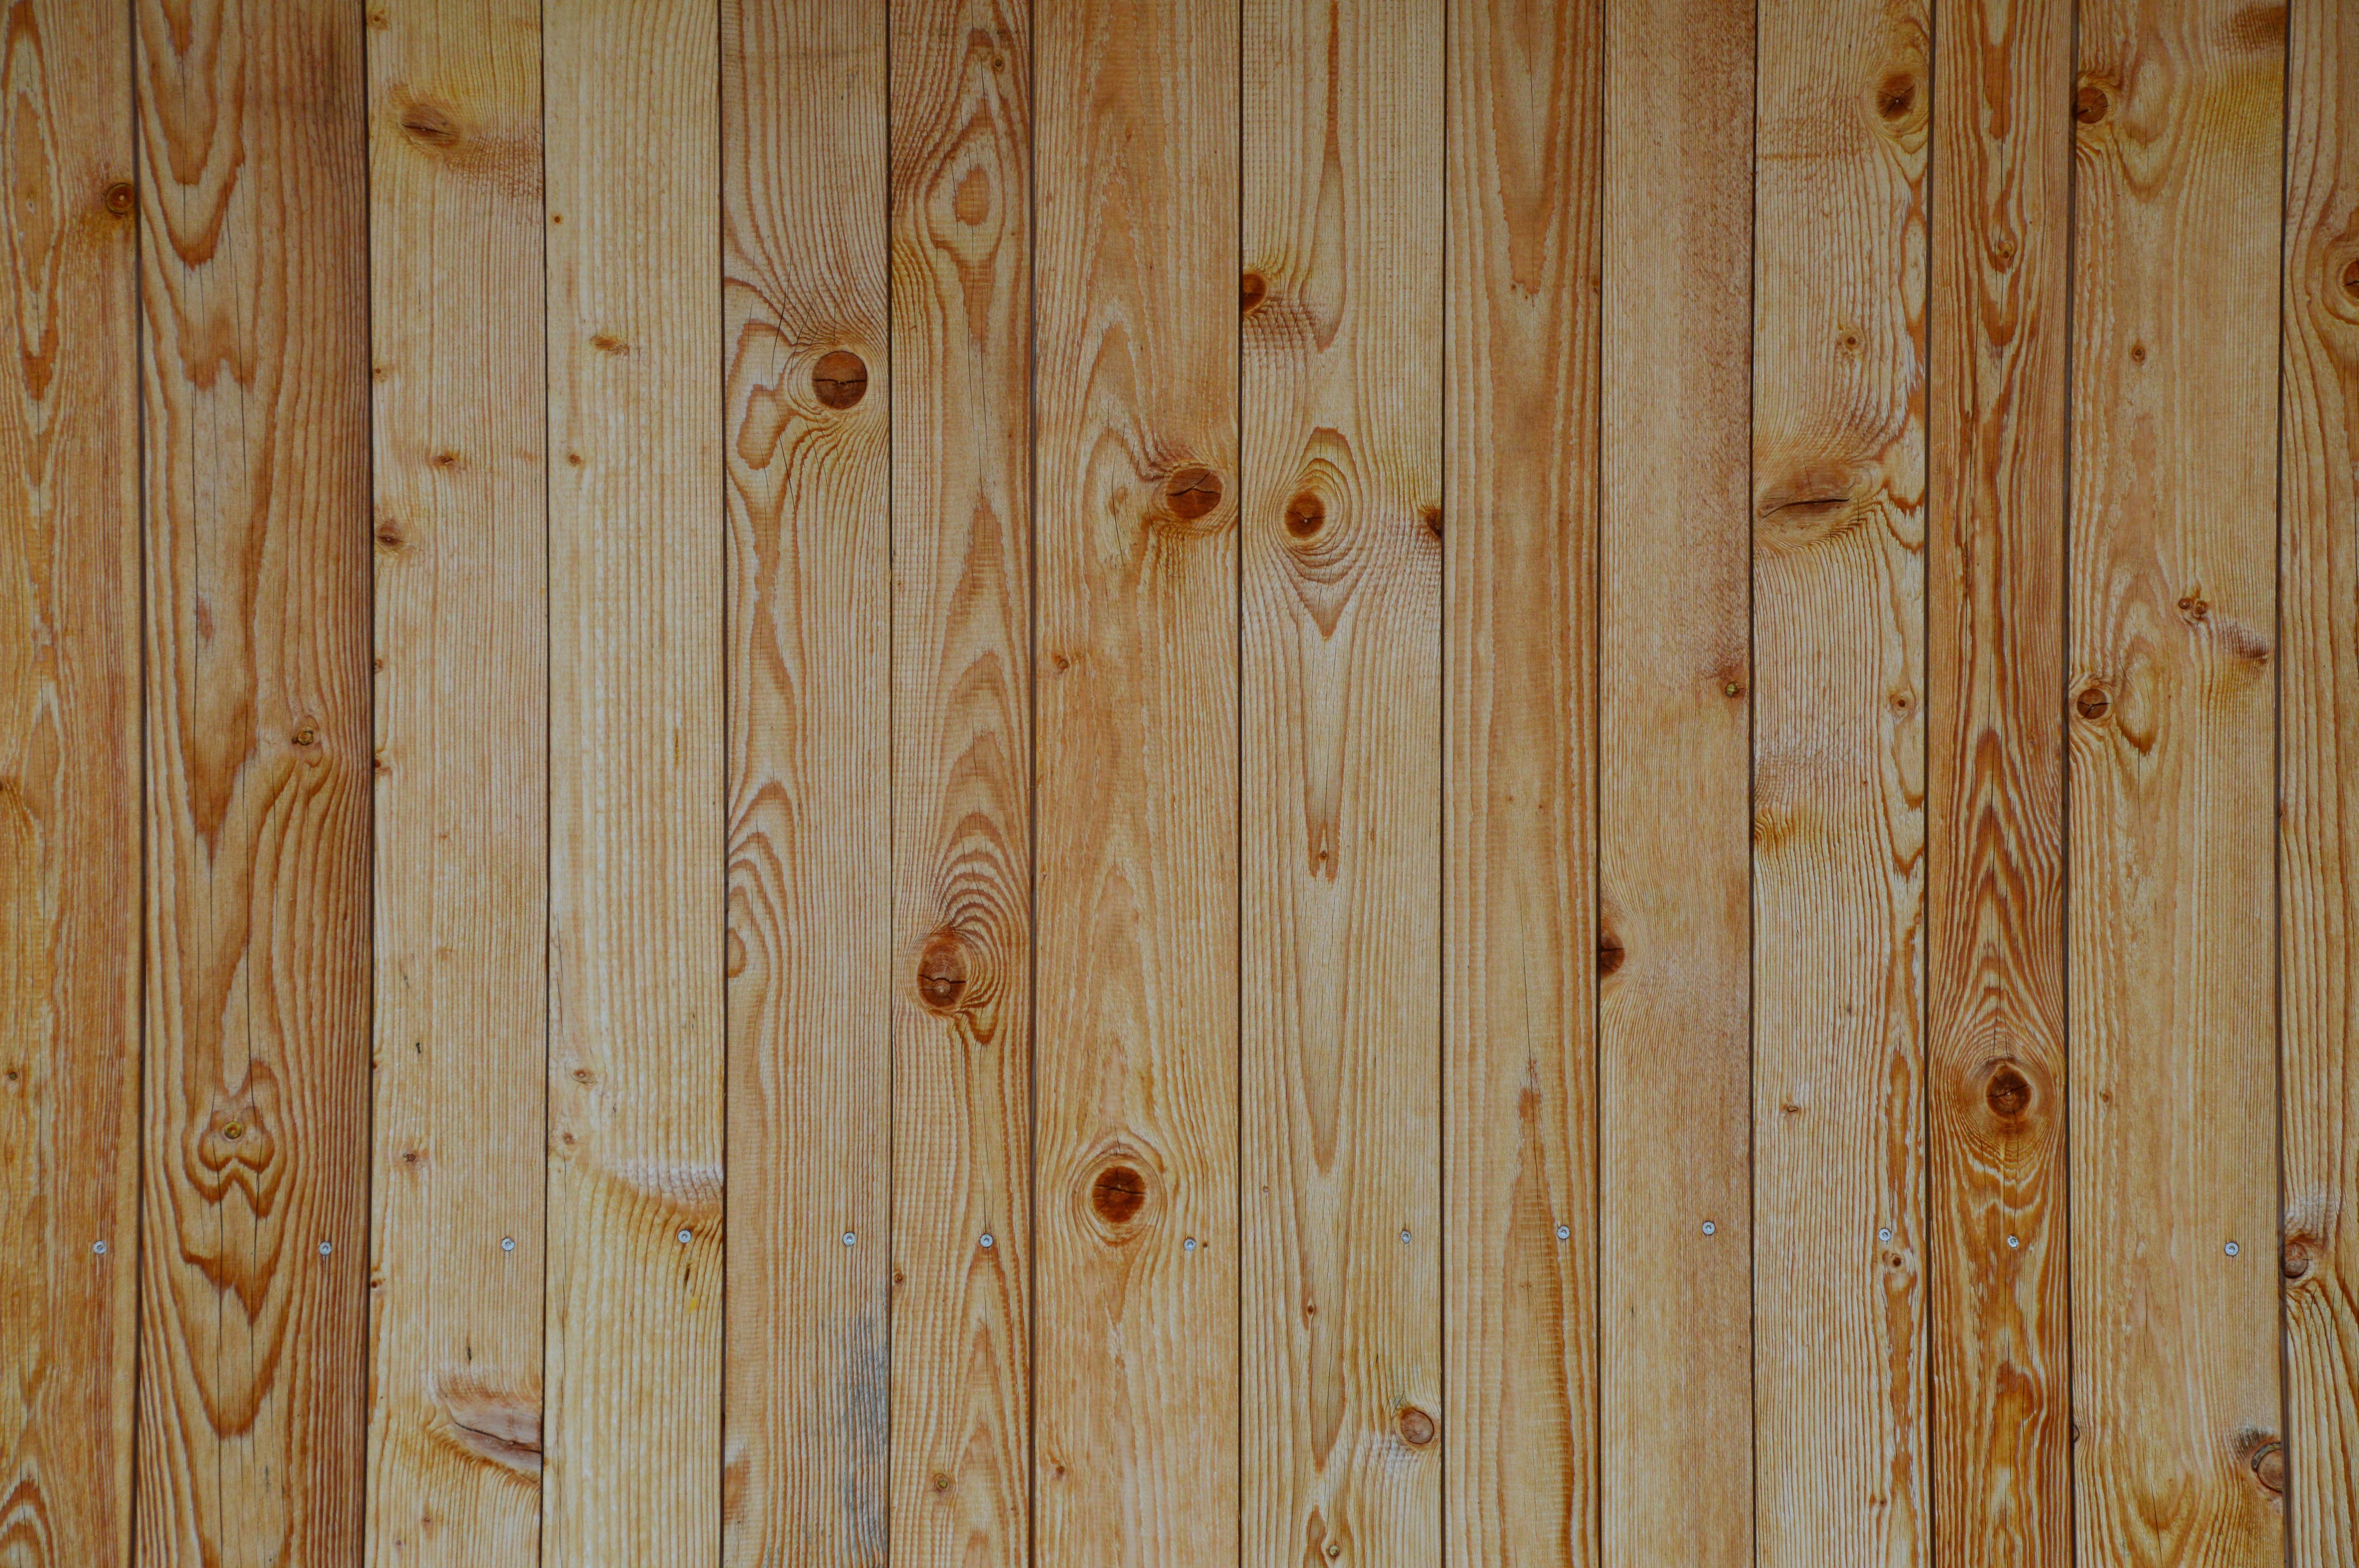 Wood Grain Texture Plank Floor Collection Fir Lumber Material Background Design Hardwood Boards Vertical Graphic Textures